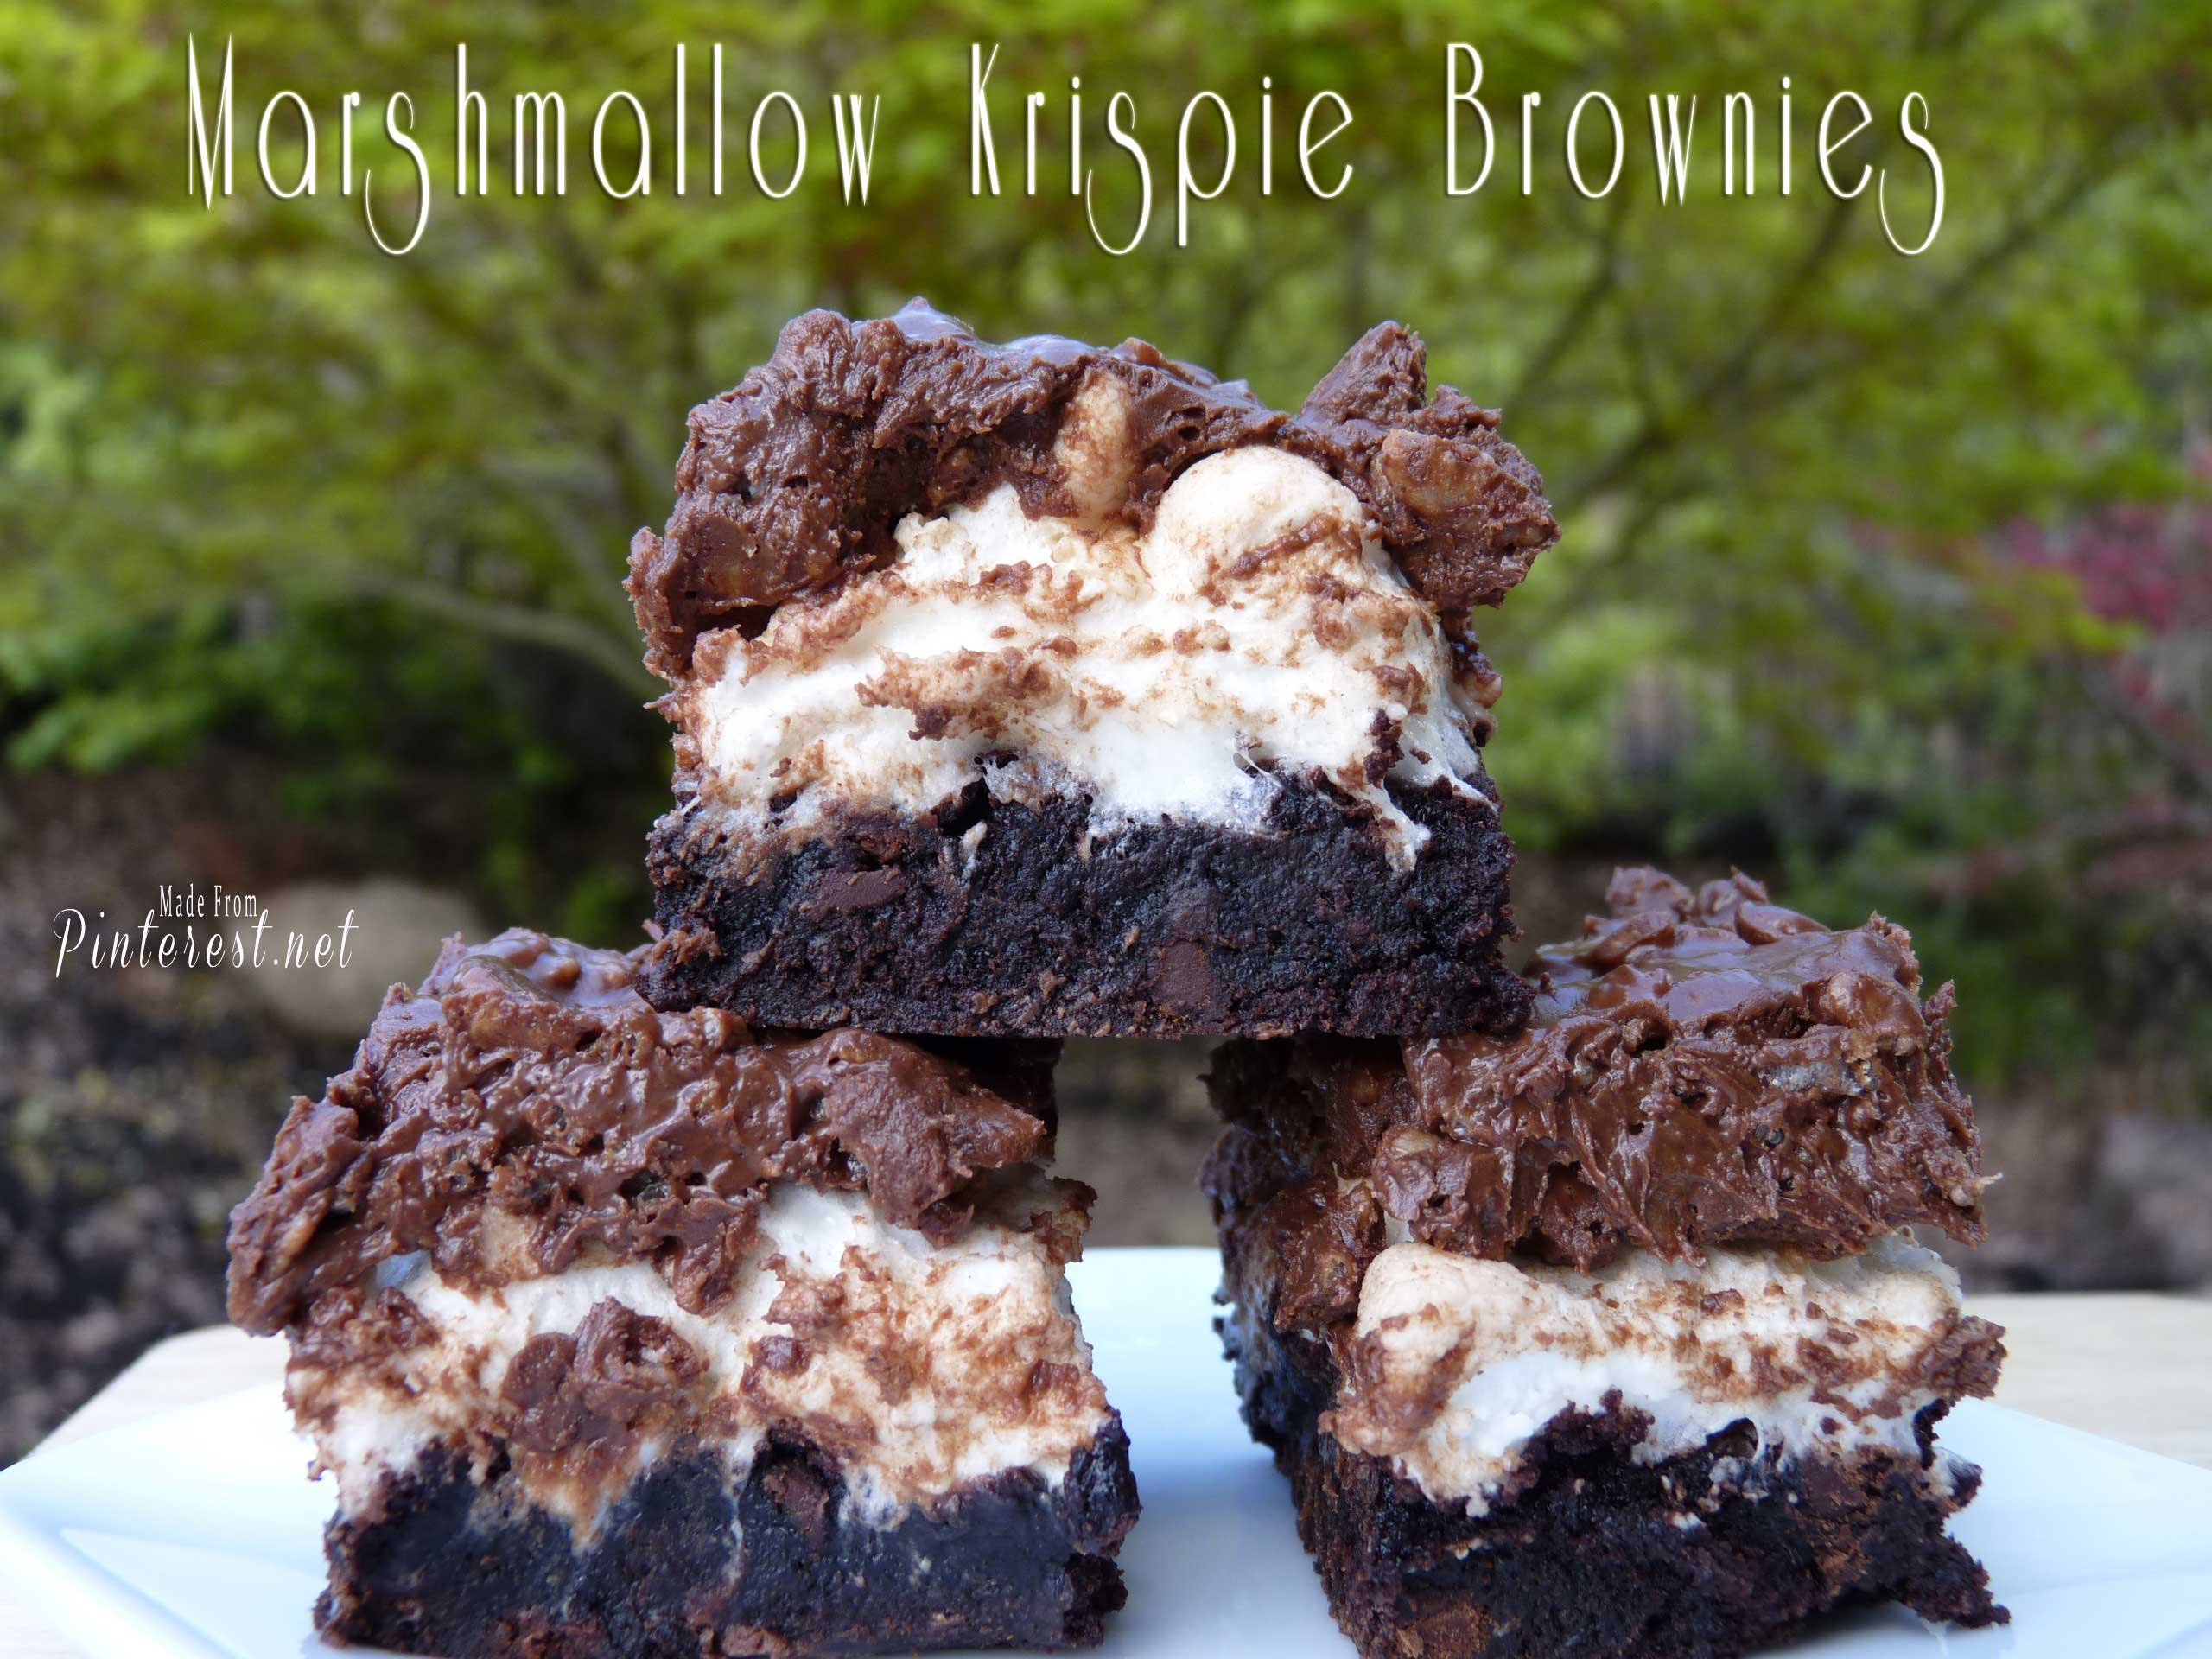 Marshmallow Krispie Marshmallow Browinies #Brownies #Marshmallow #Rice Krispies